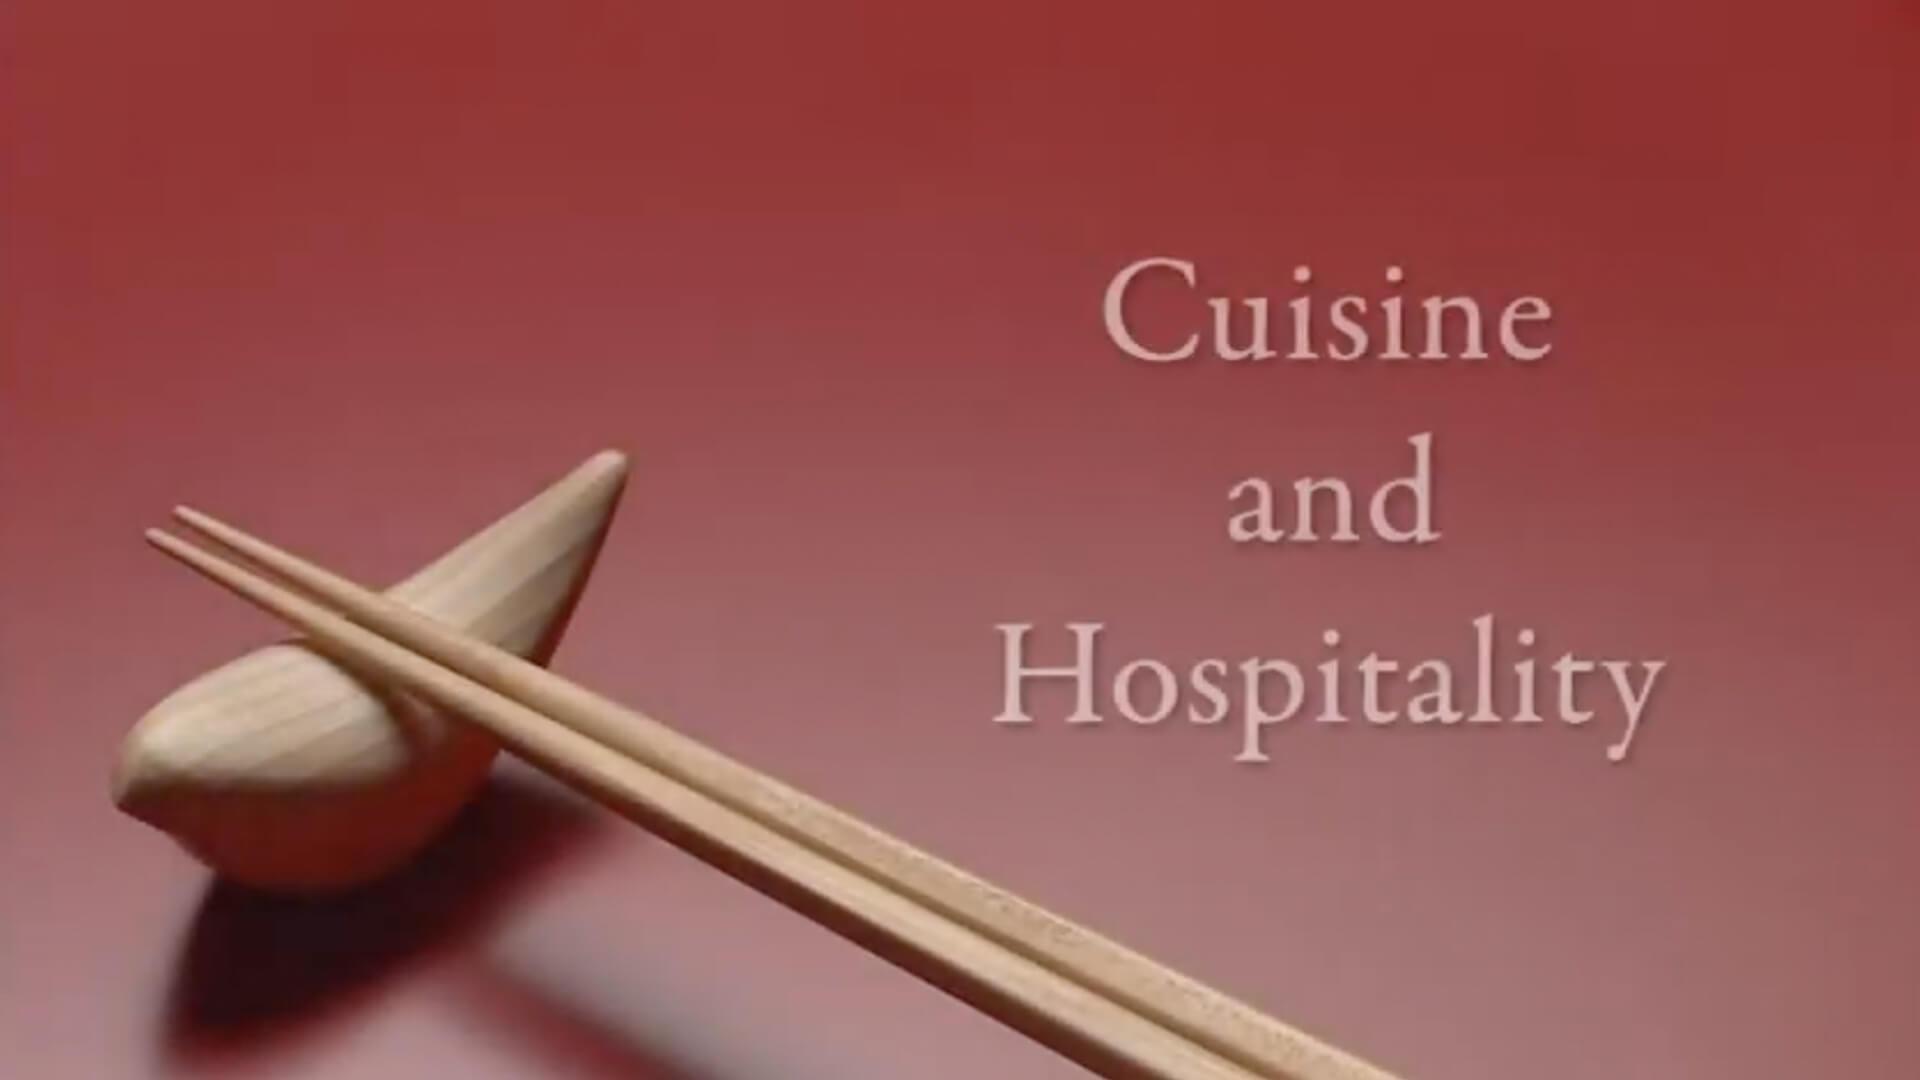 Cuisine and Hospitality